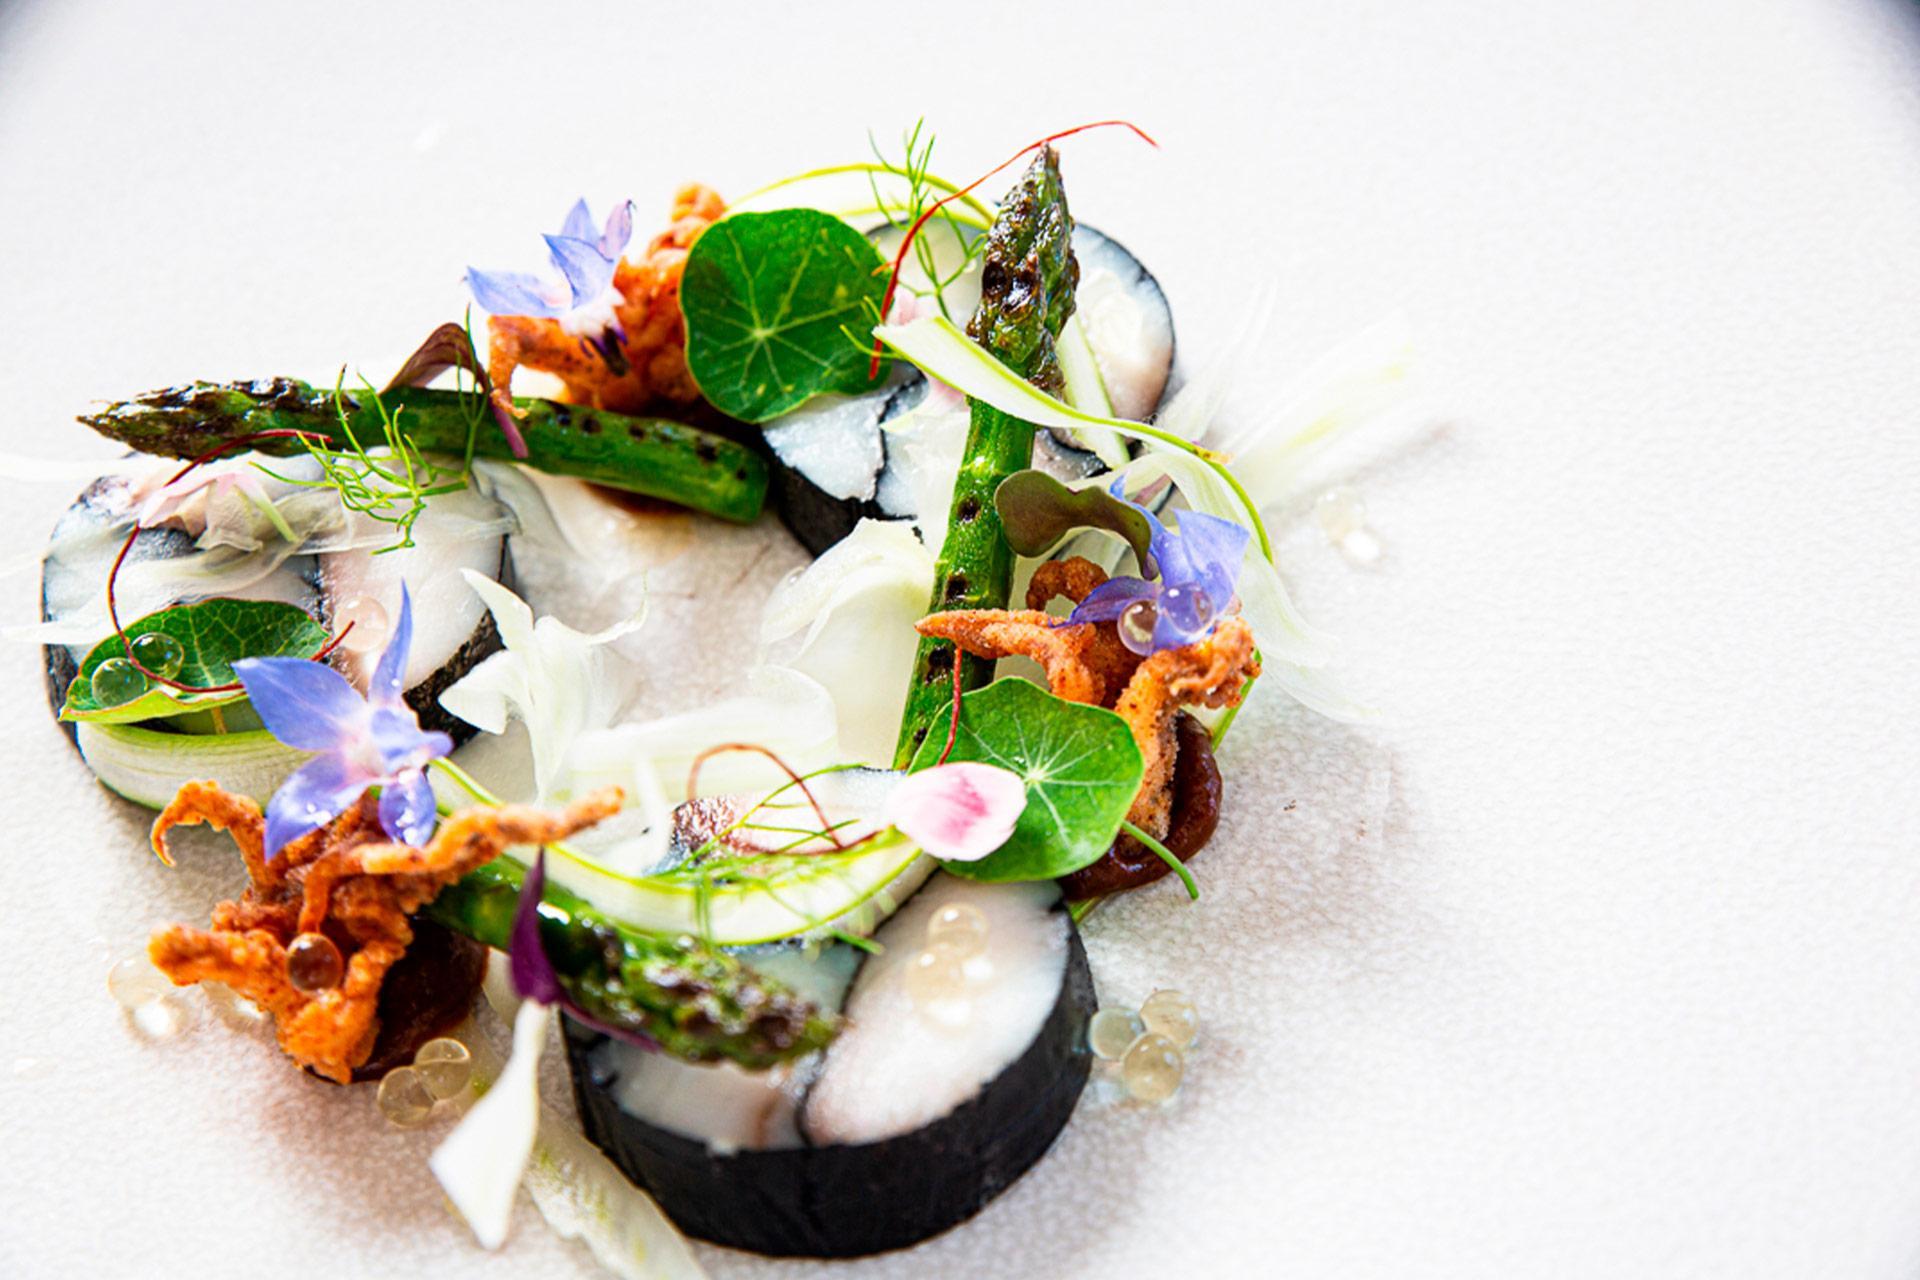 Le Coin Francais by Chef Darren Badenhorst